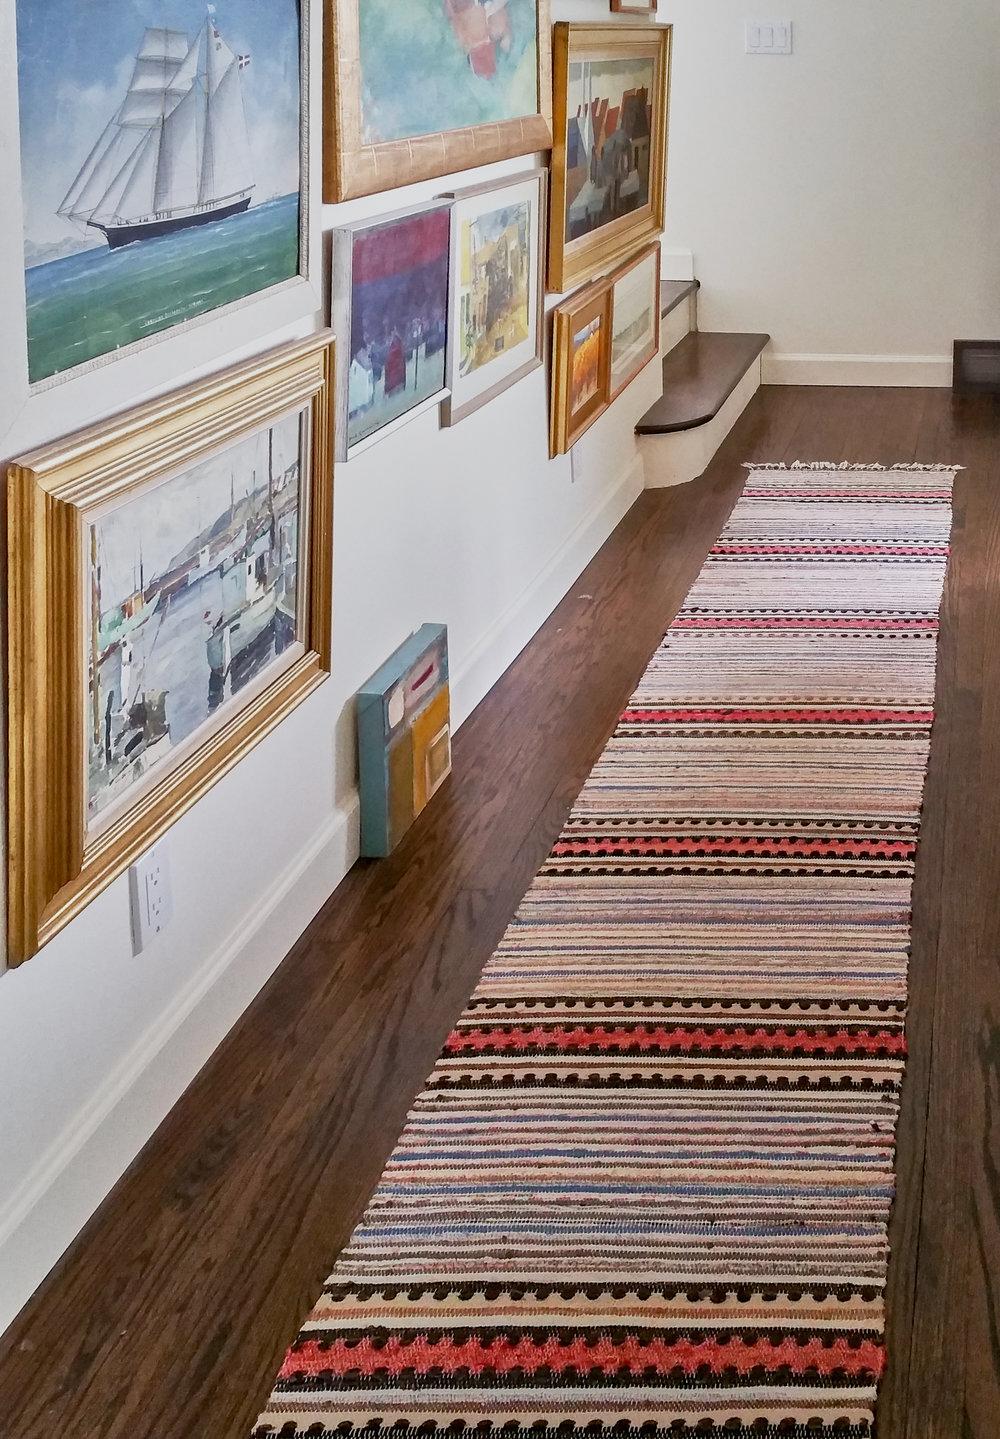 hallway swedish rug 0.jpg